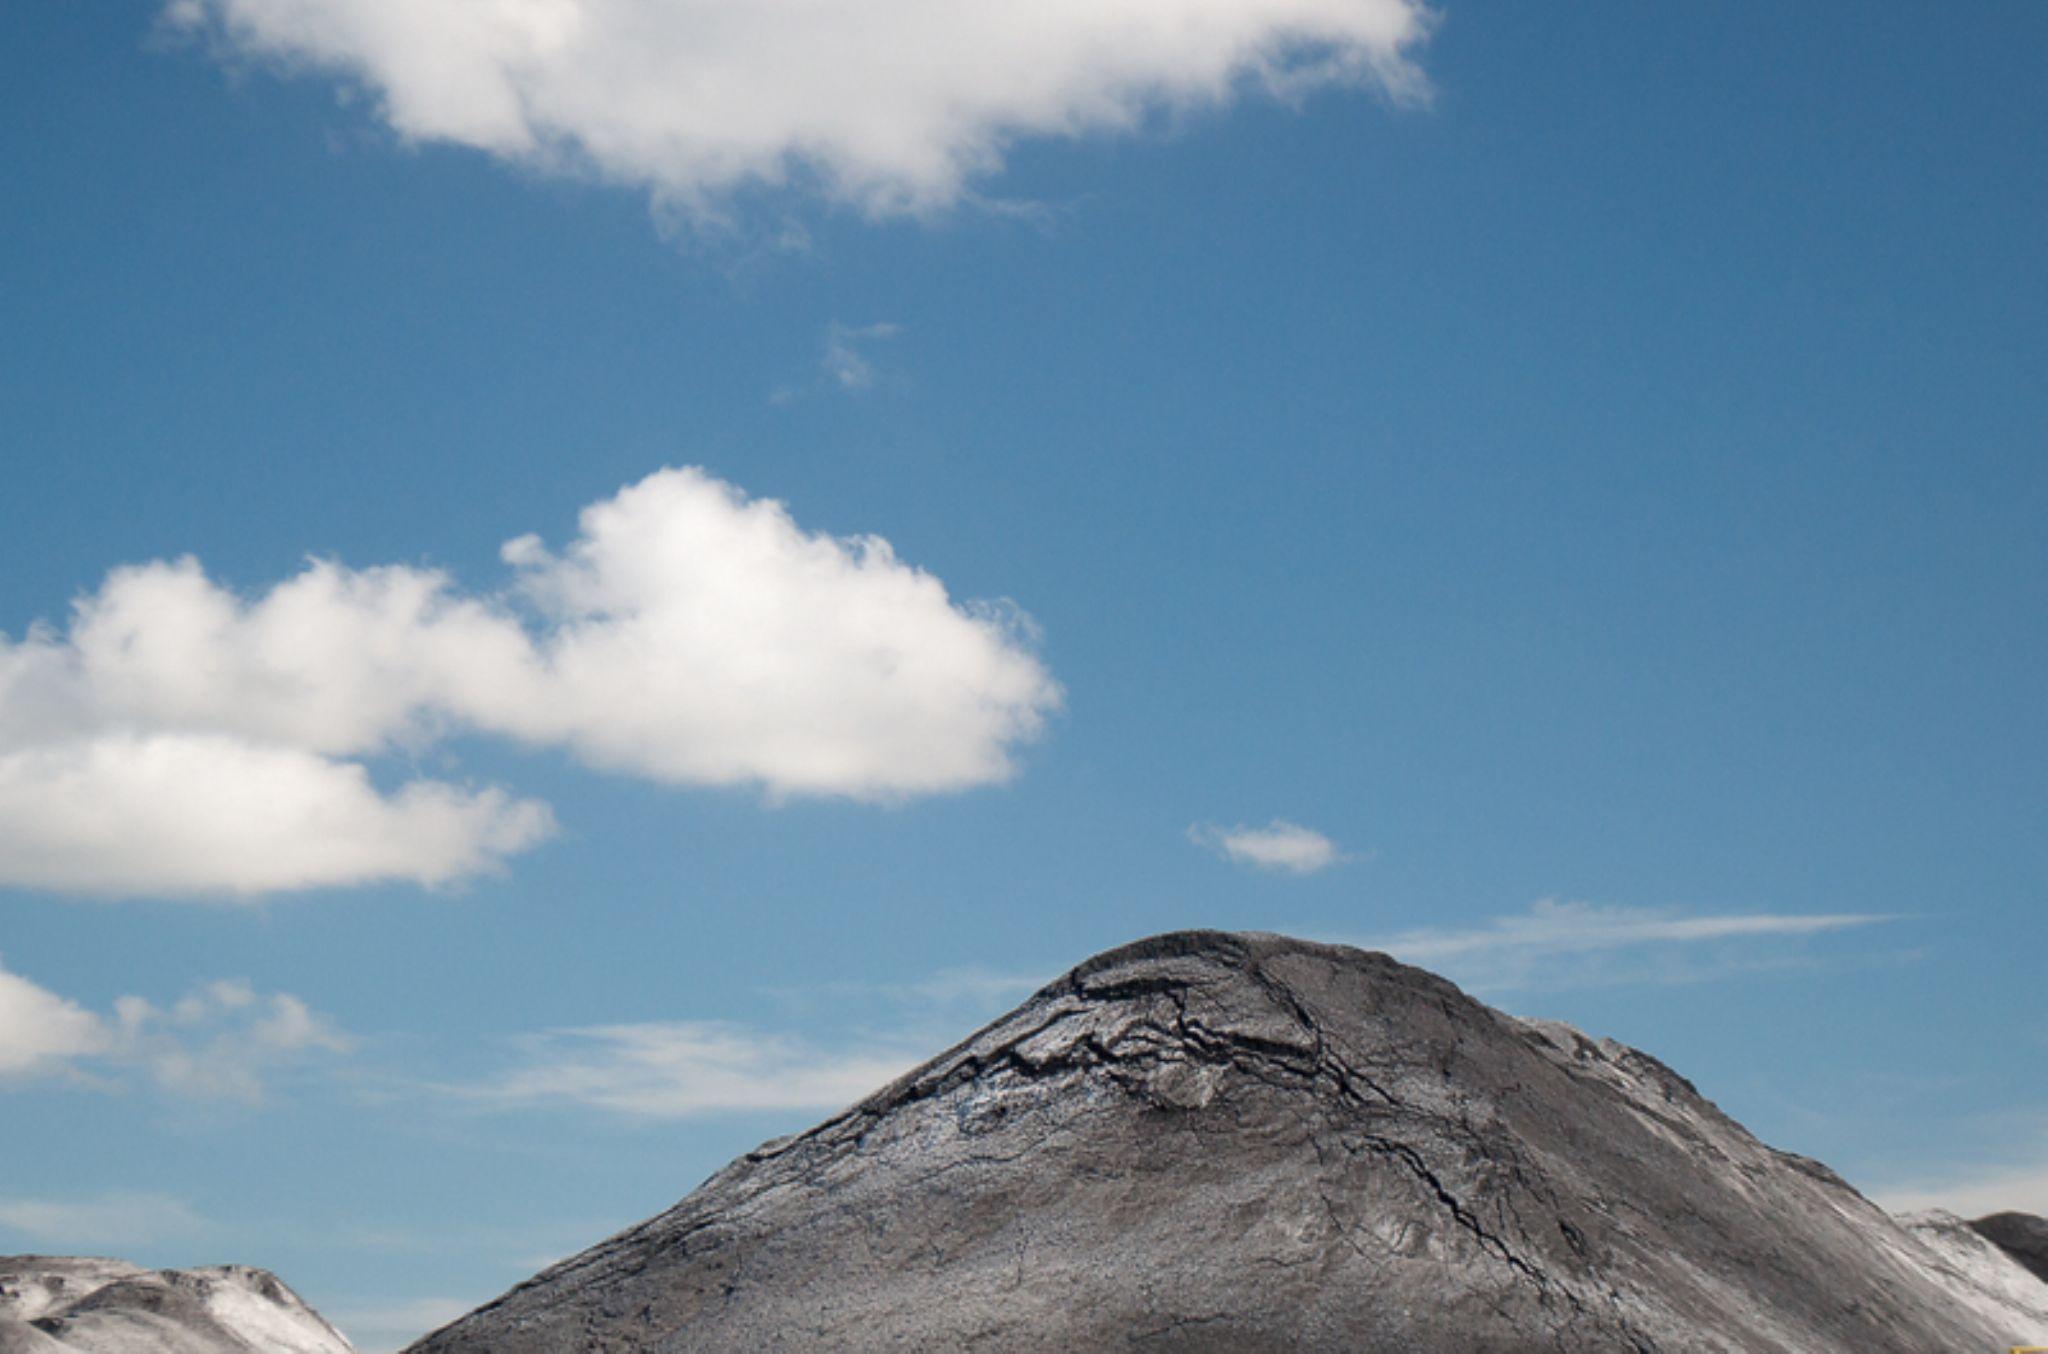 dutch mountain by PeterVTRSP1